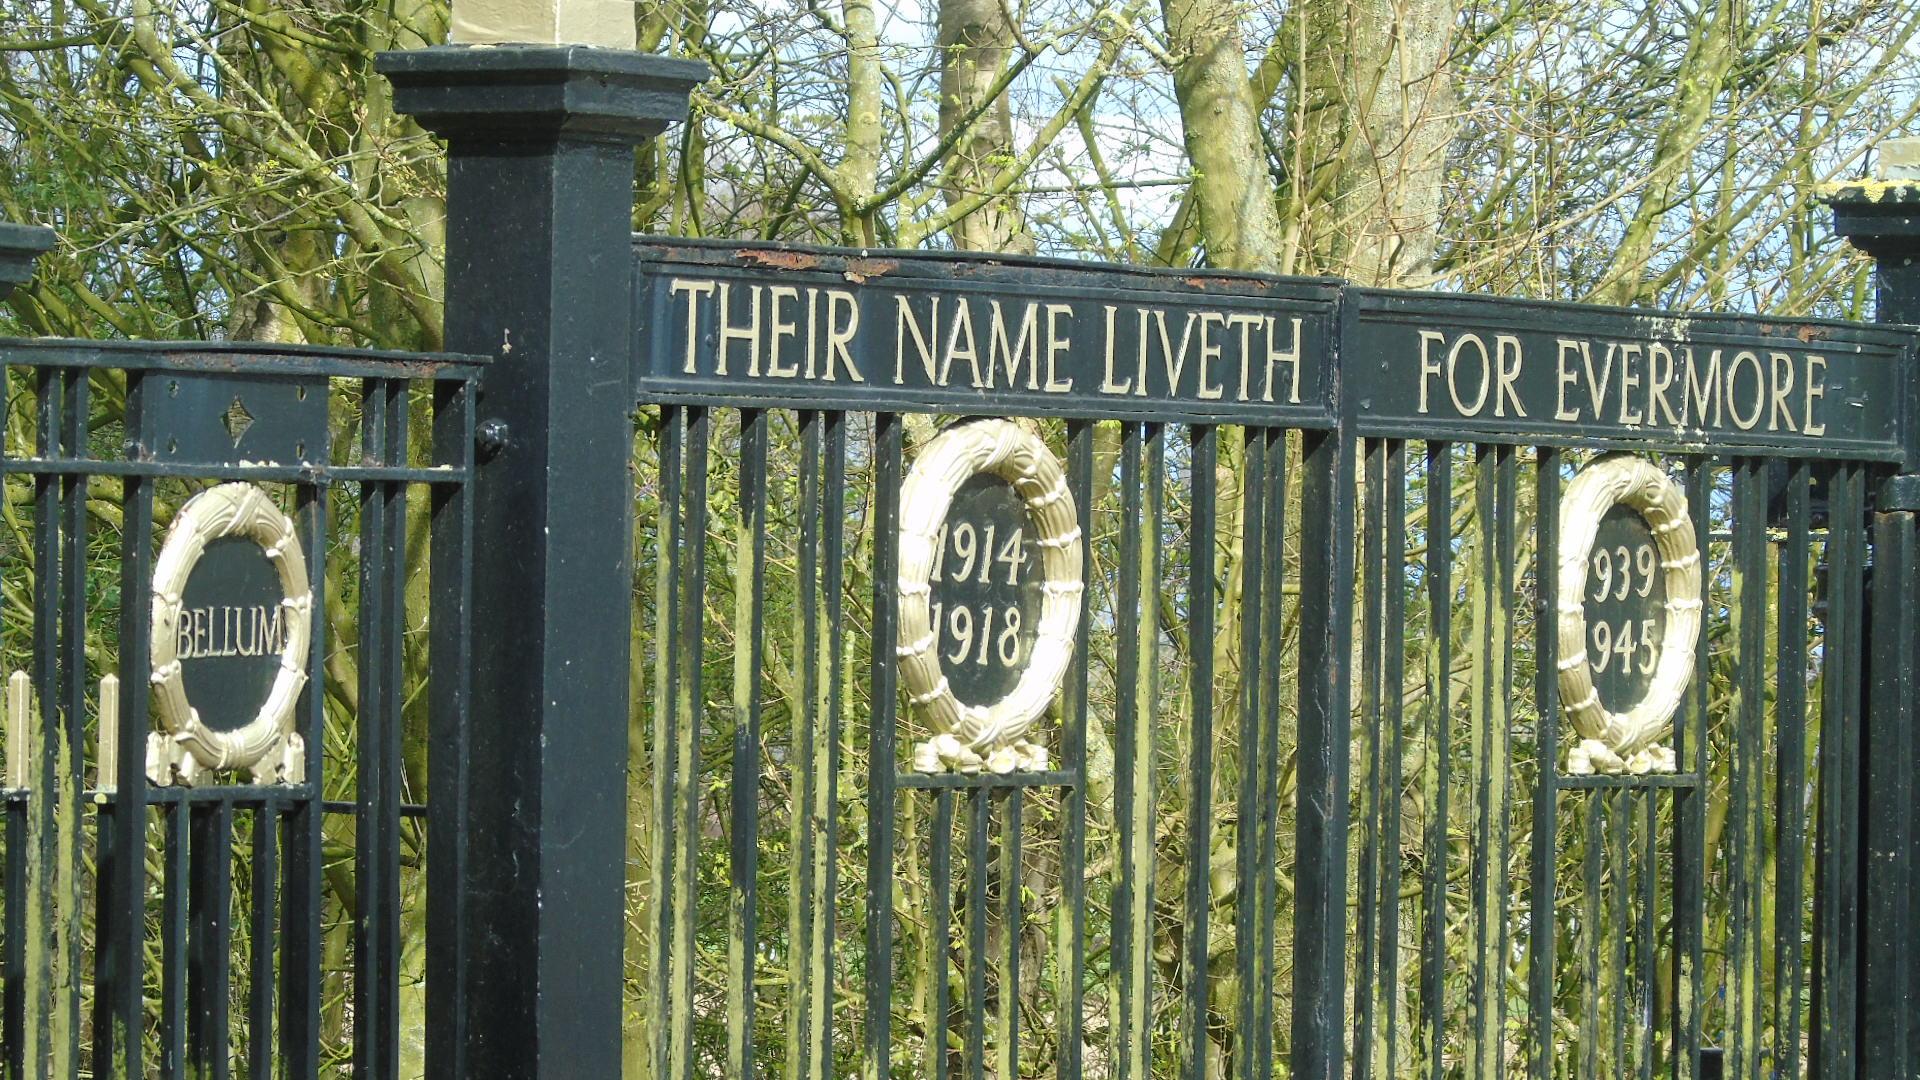 Frodsham Hill